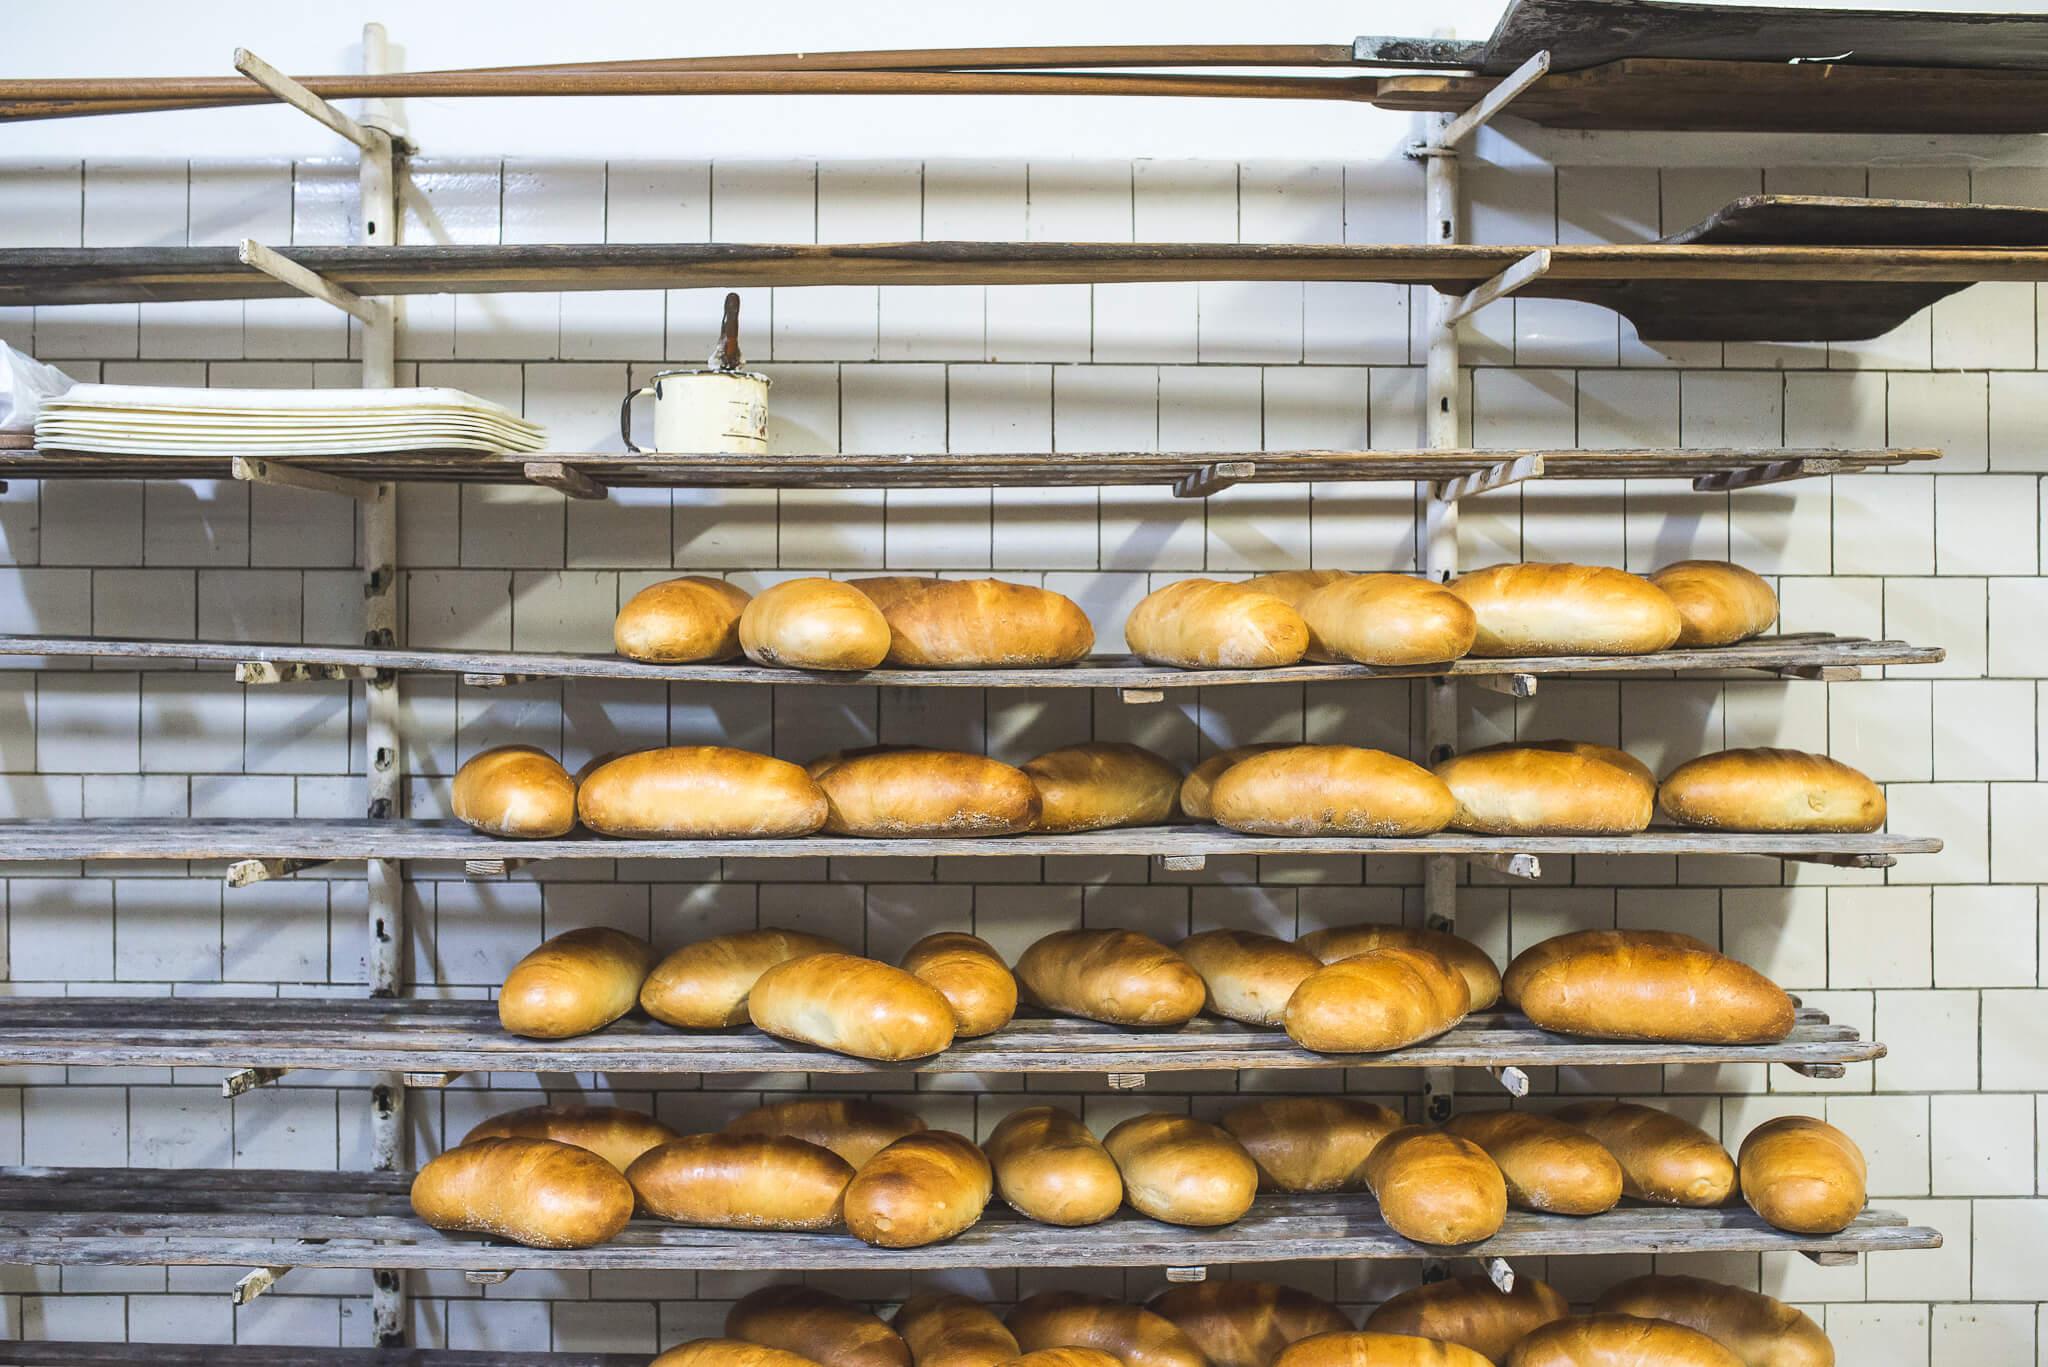 Majchrowski 1 1 - Artisan bread in pomorskie - tradition and modernity